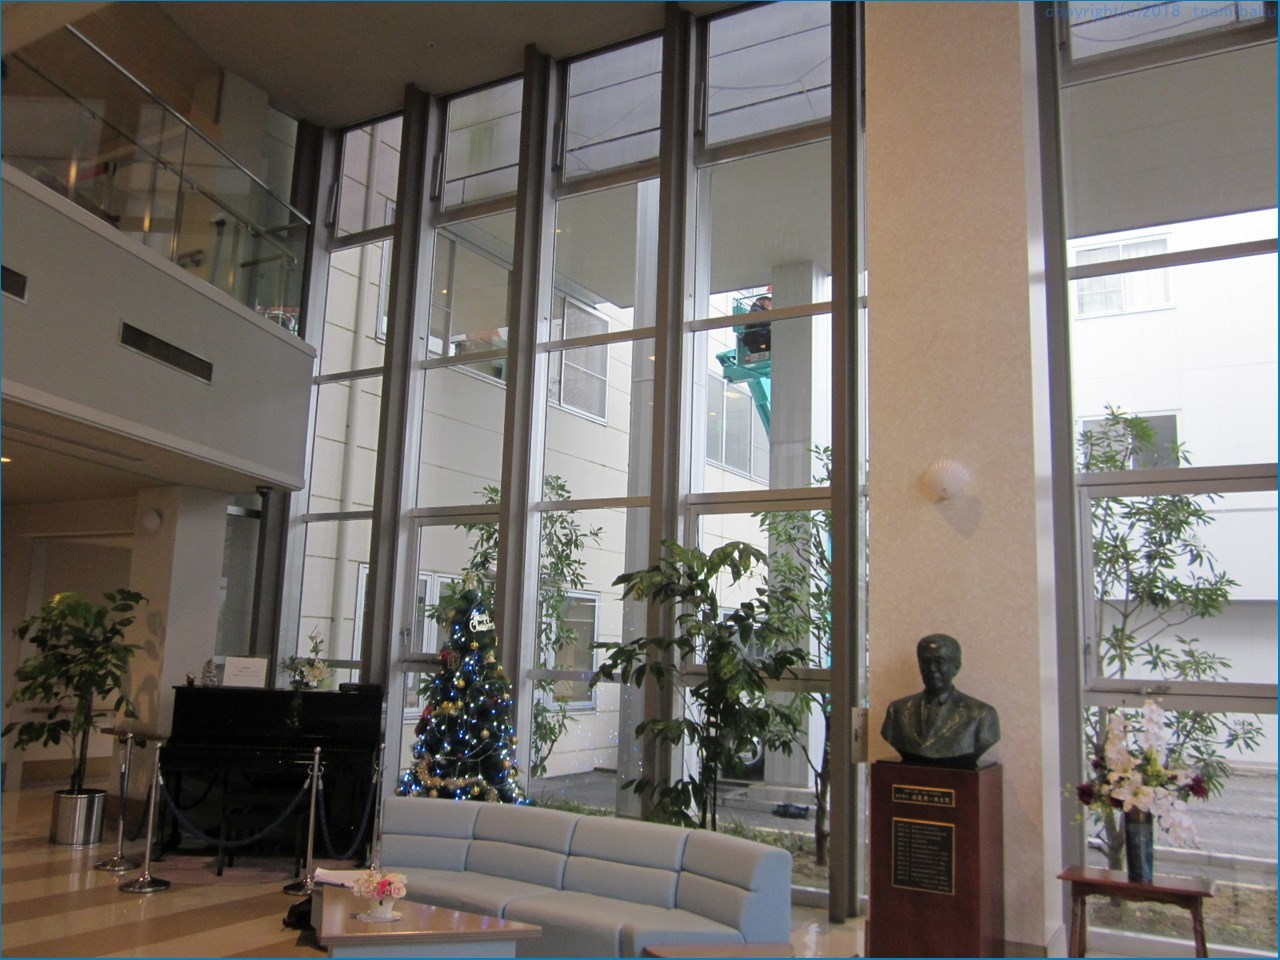 N病院グループ 特定建築物の定期報告調査4_c0376508_14134878.jpg